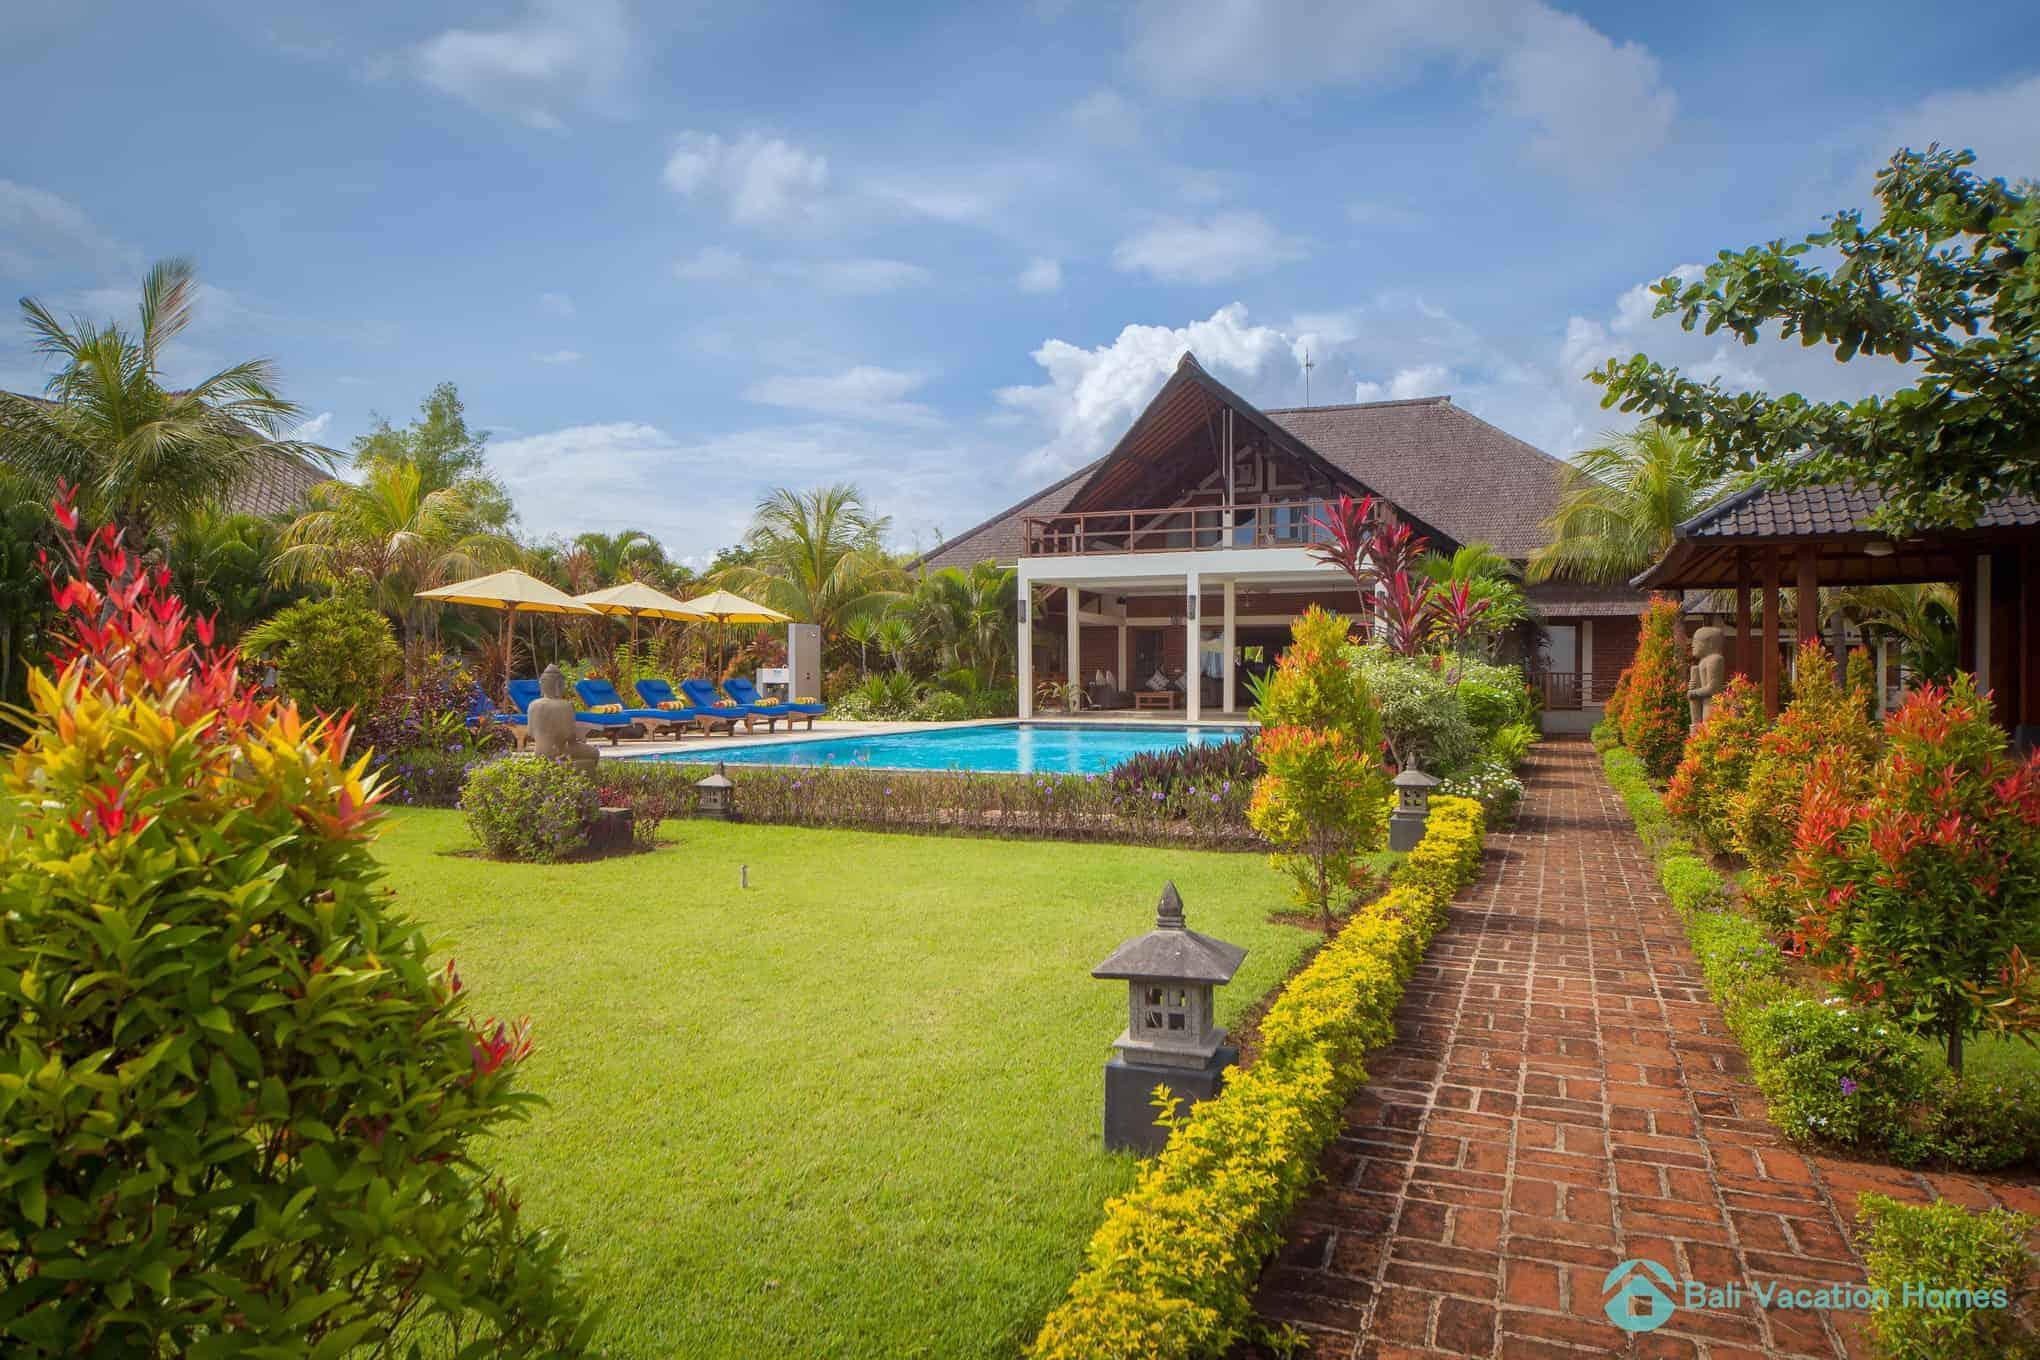 villa-lumba-lumba-bali-vacation-homes-001_2